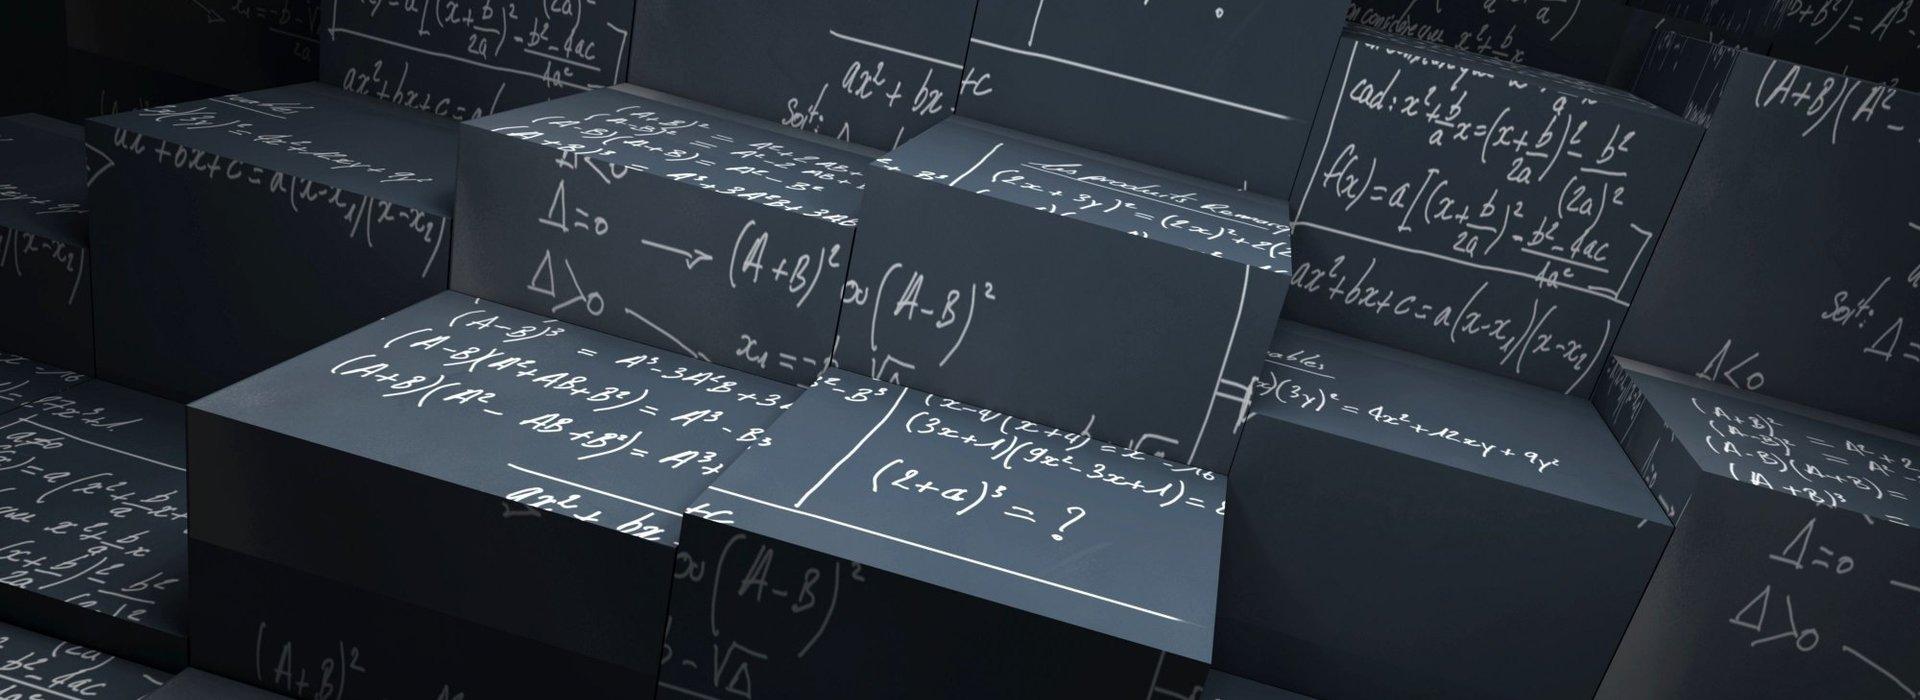 Кафедра высшей математики иметодики преподавания математики